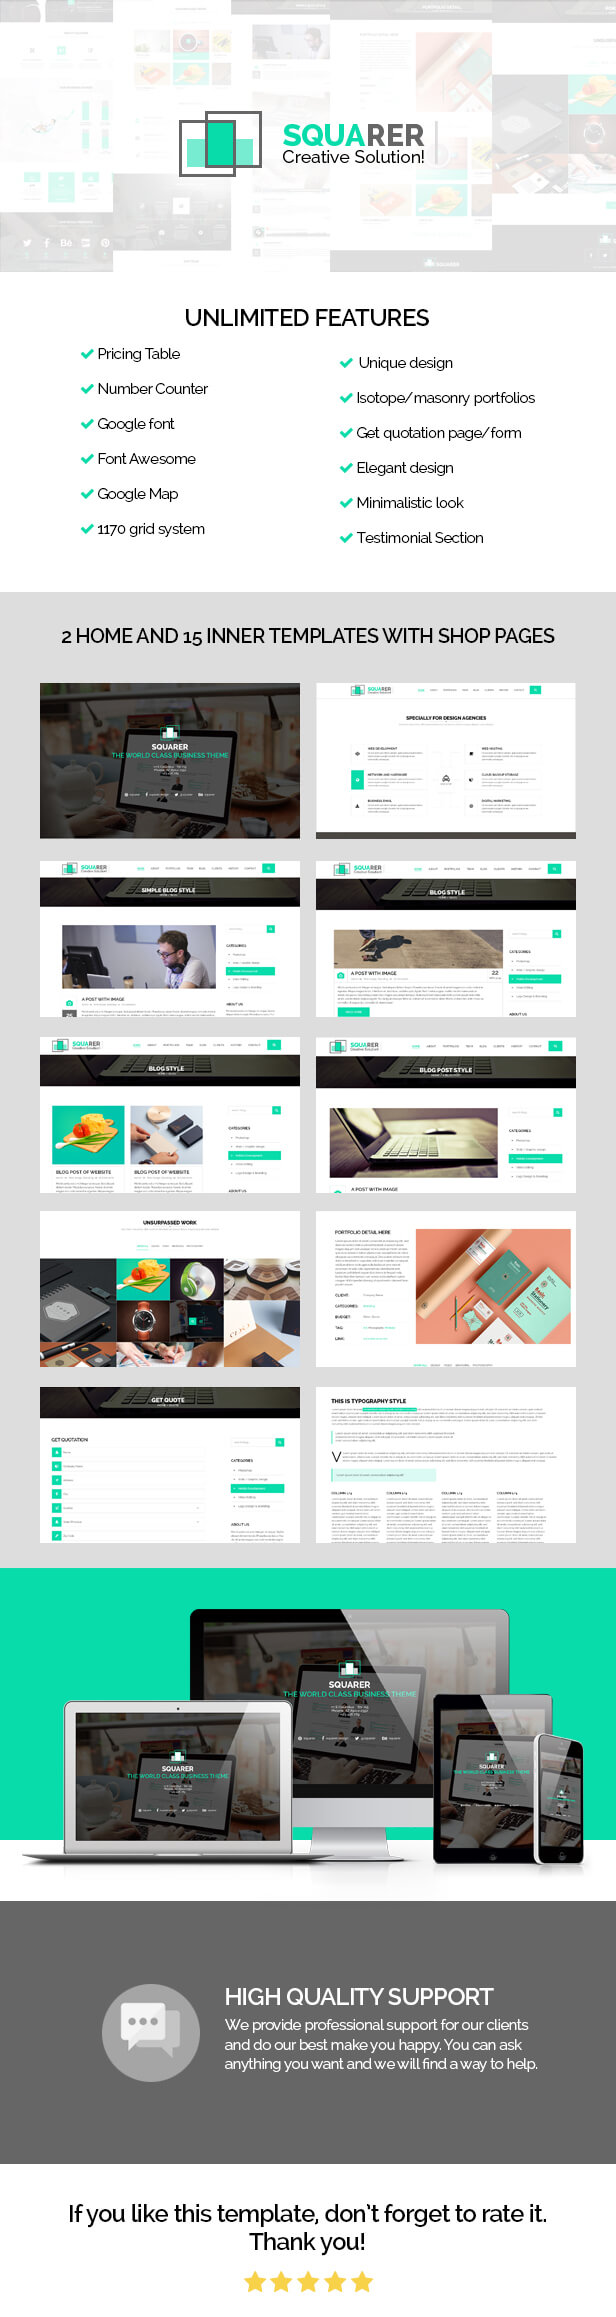 Squarer Agency PSD Template - 3